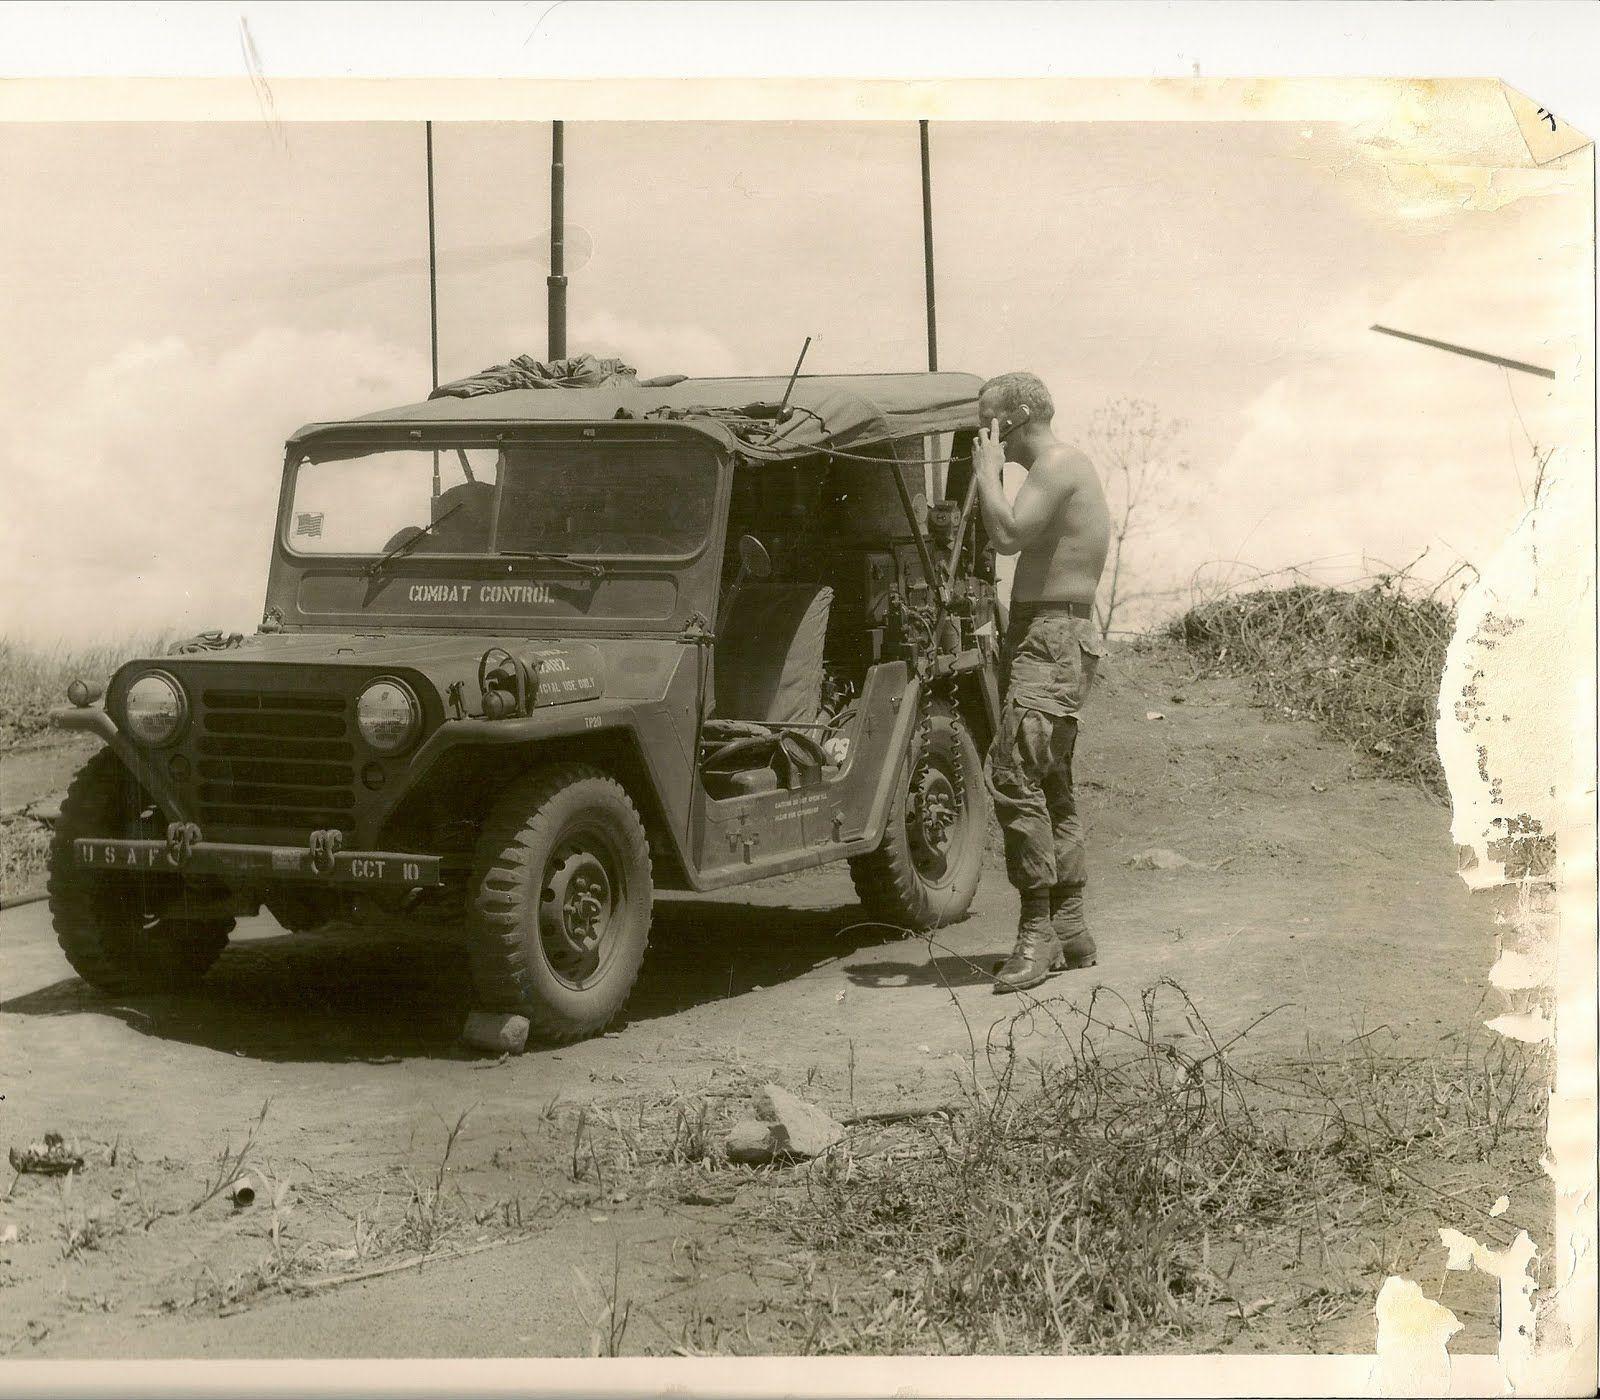 M151A1 CCT Jeep with MRC108 Radio restoration for Natl